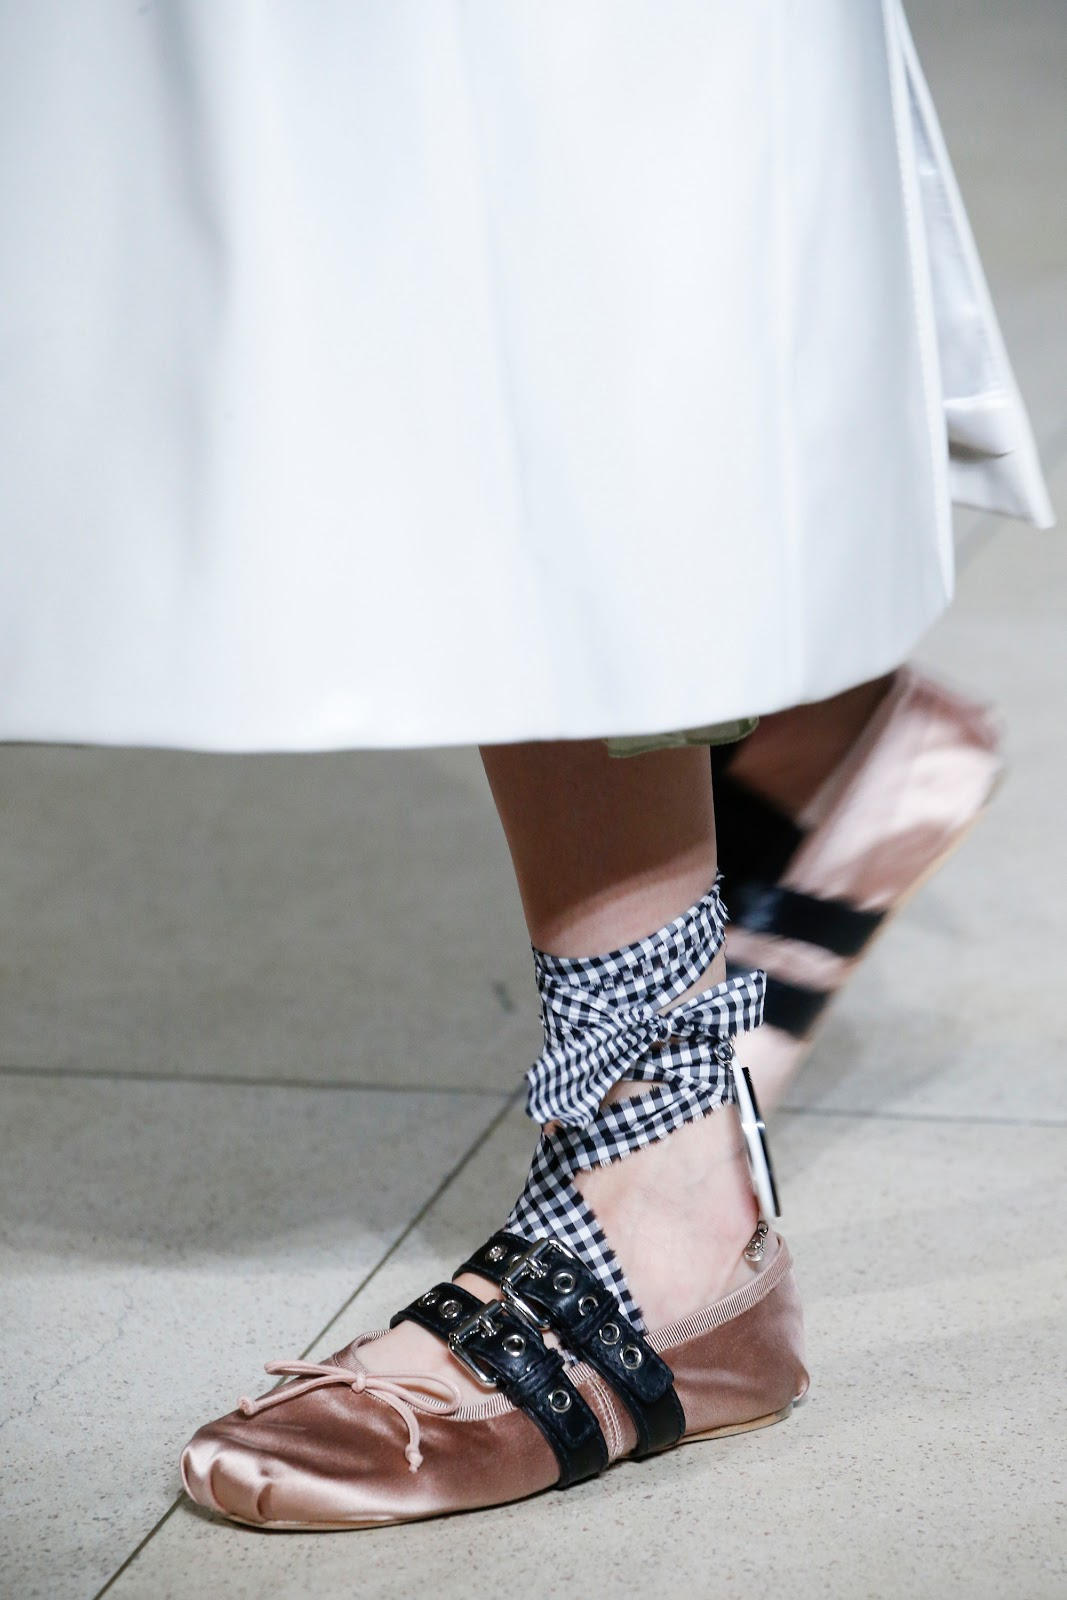 fashion inspiration shoe trend spring 2016 miu miu buckle embellished leather ballerinas. Black Bedroom Furniture Sets. Home Design Ideas